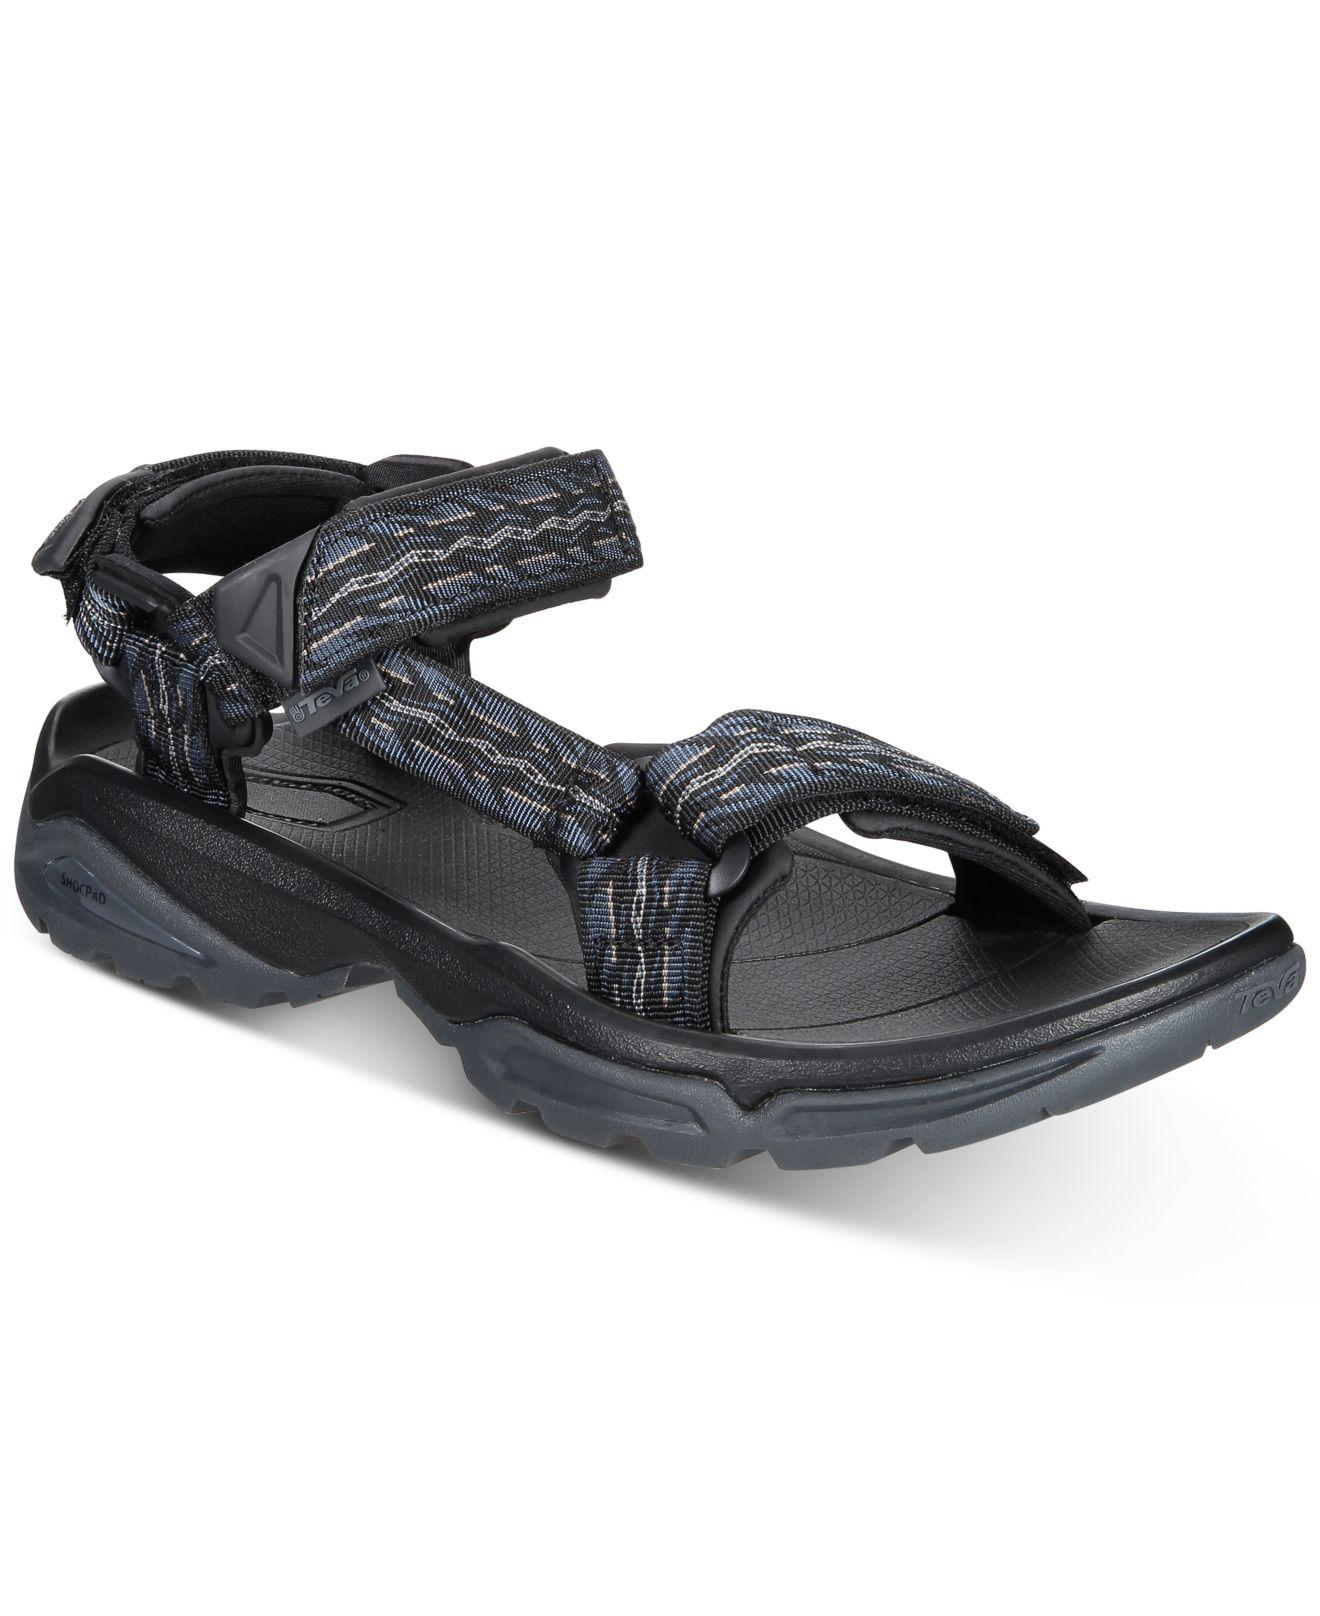 7da60012dd8a Lyst - Teva M Terra Fi 4 Water-resistant Sandals for Men